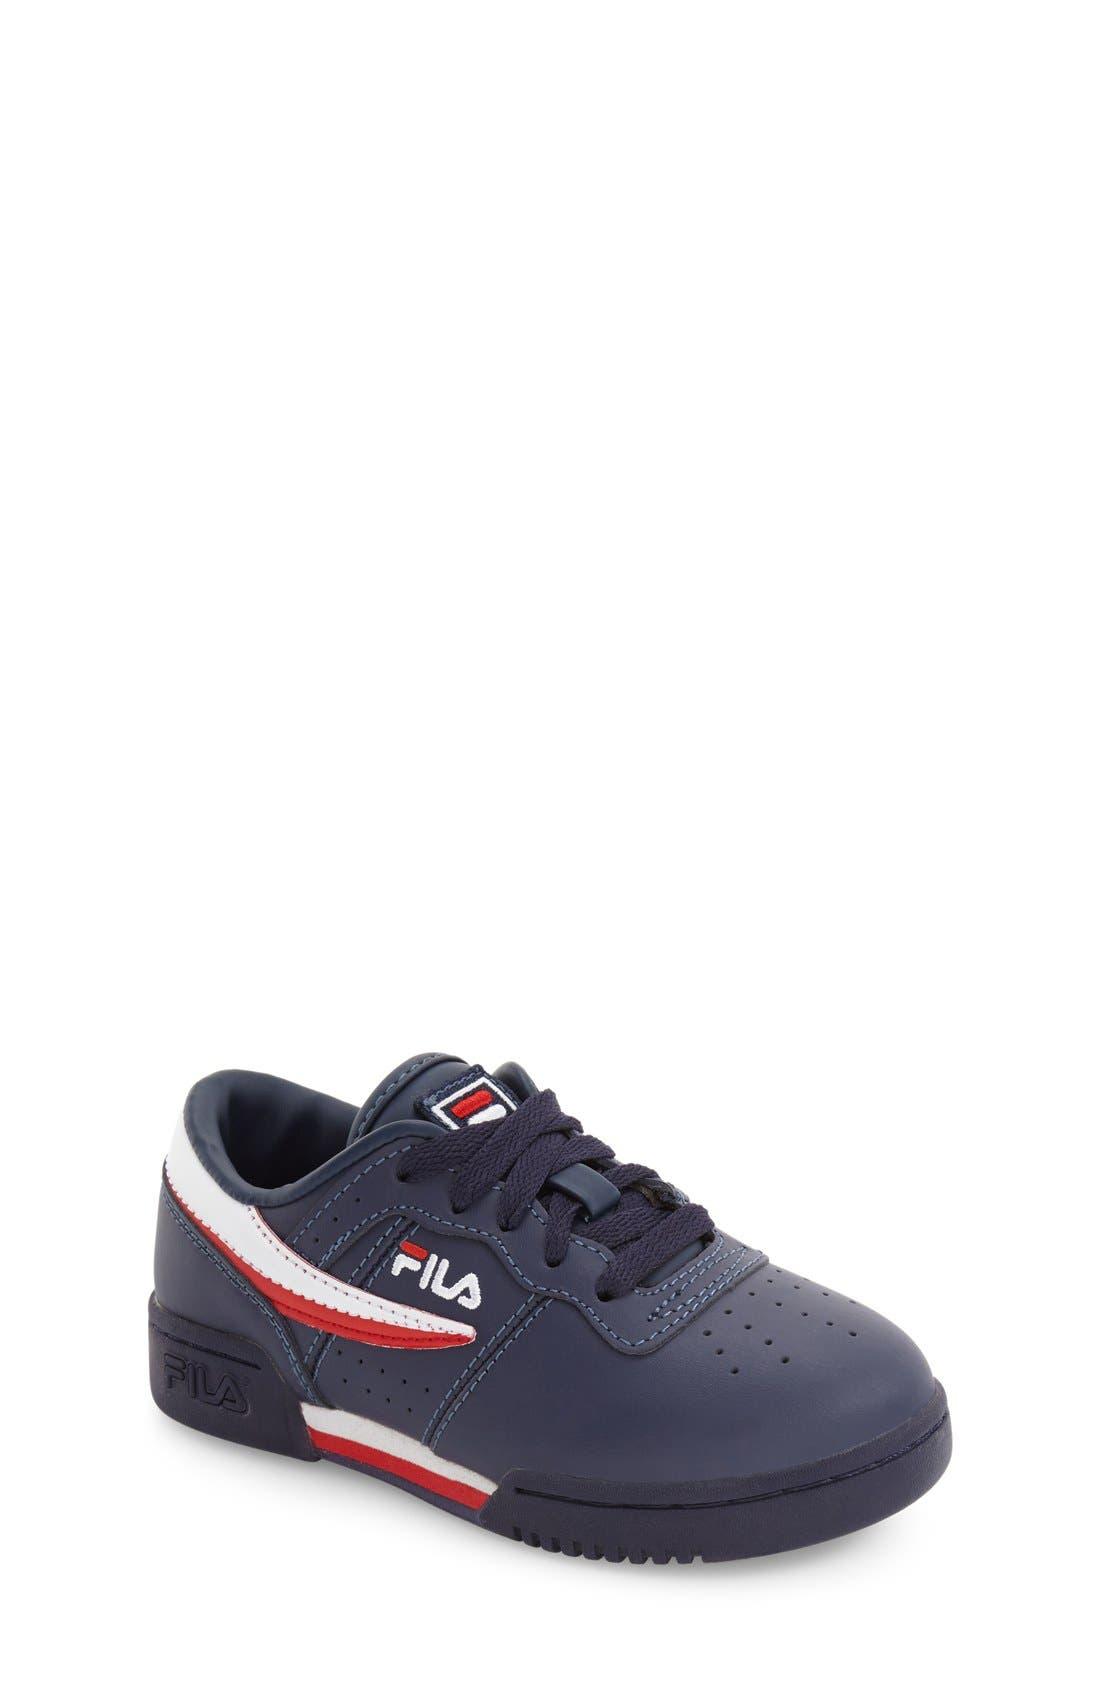 Alternate Image 1 Selected - FILA Original Sneaker (Toddler, Little Kid & Big Kid)